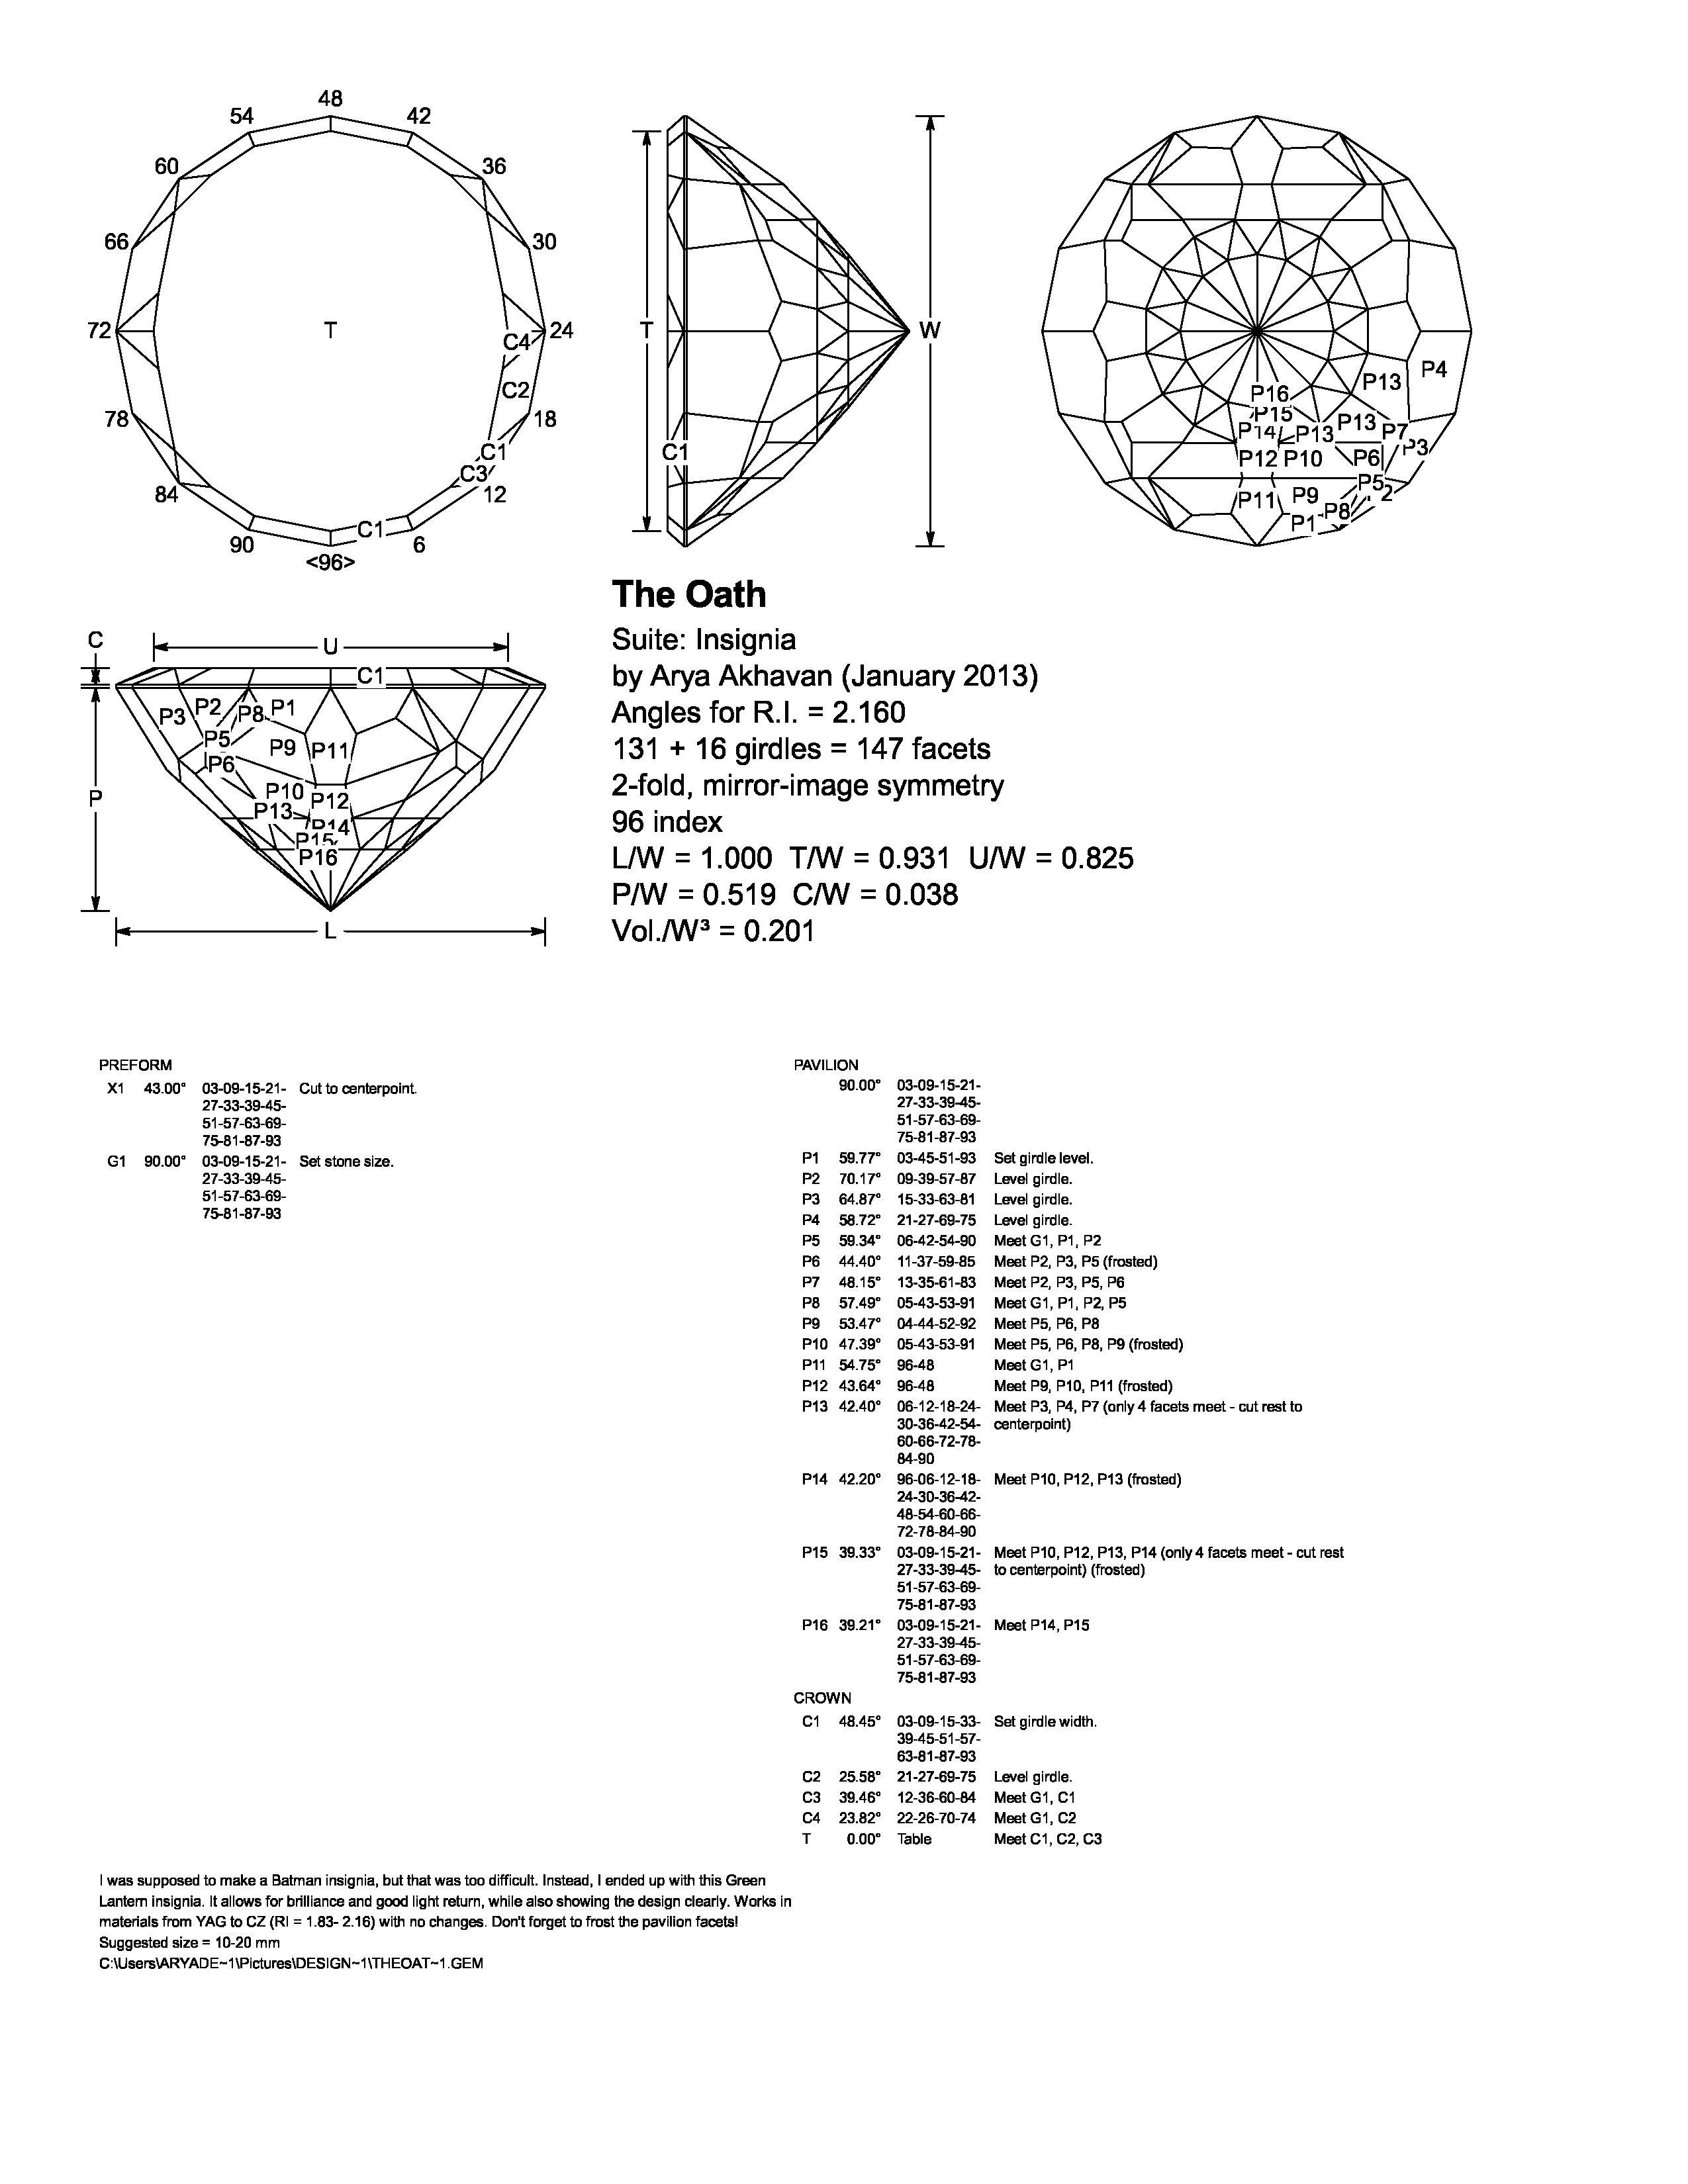 File The Oath Diagram